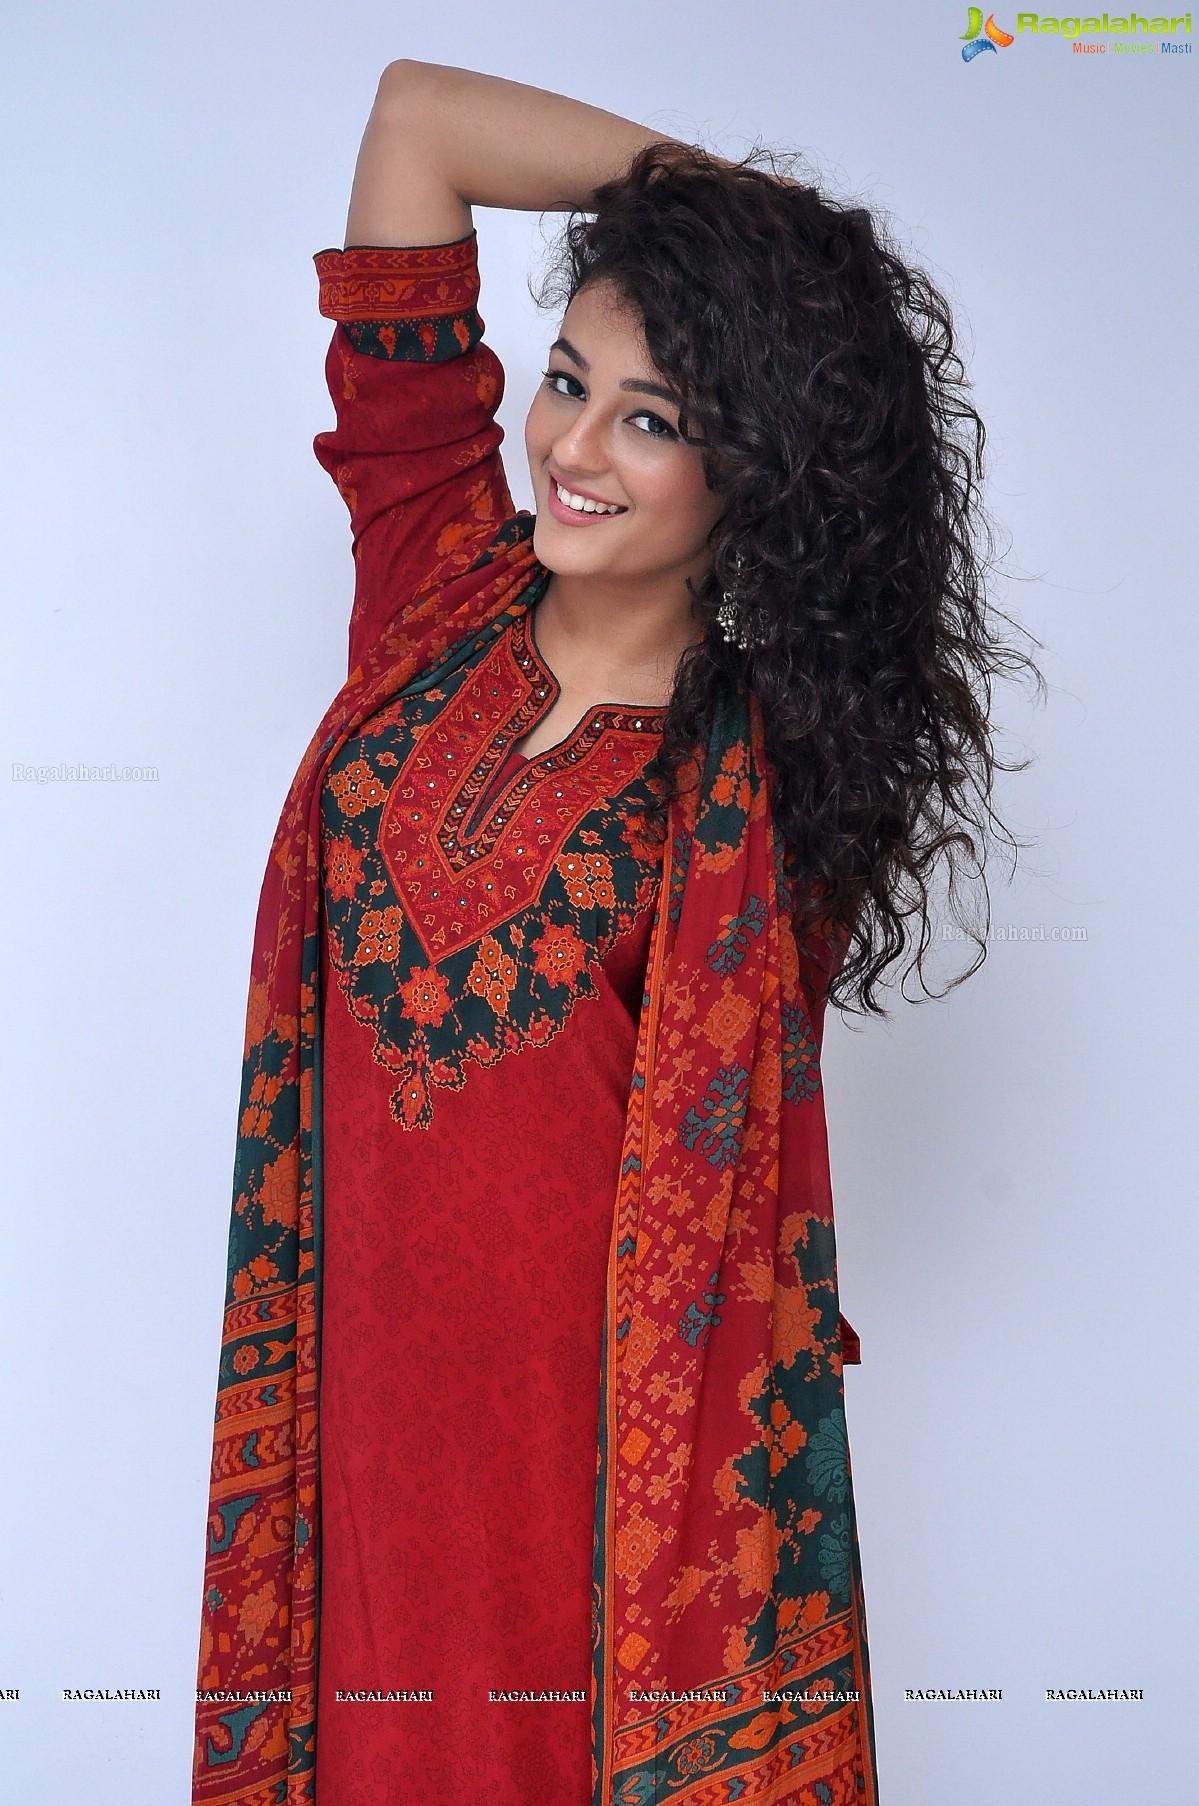 Seerat Kapoor Image 85 Telugu Cinema Heroines Photos Gallery